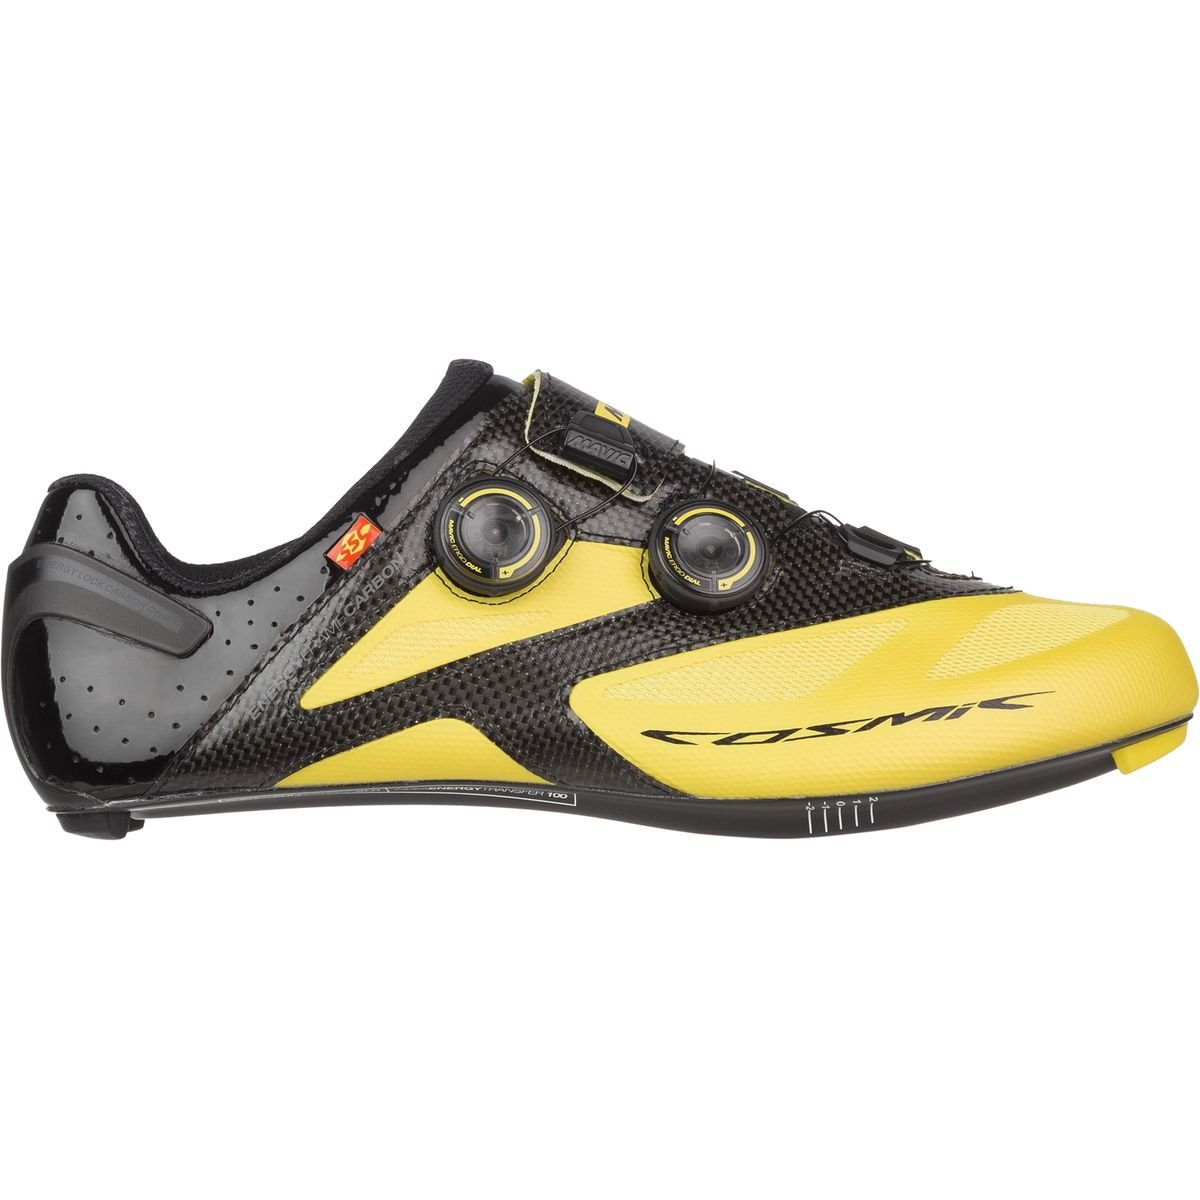 Mavic Cosmic Cosmic Cosmic Ultimate Maxi Rennrad Fahrrad Schuhe gelb schwarz 2017 63b75e